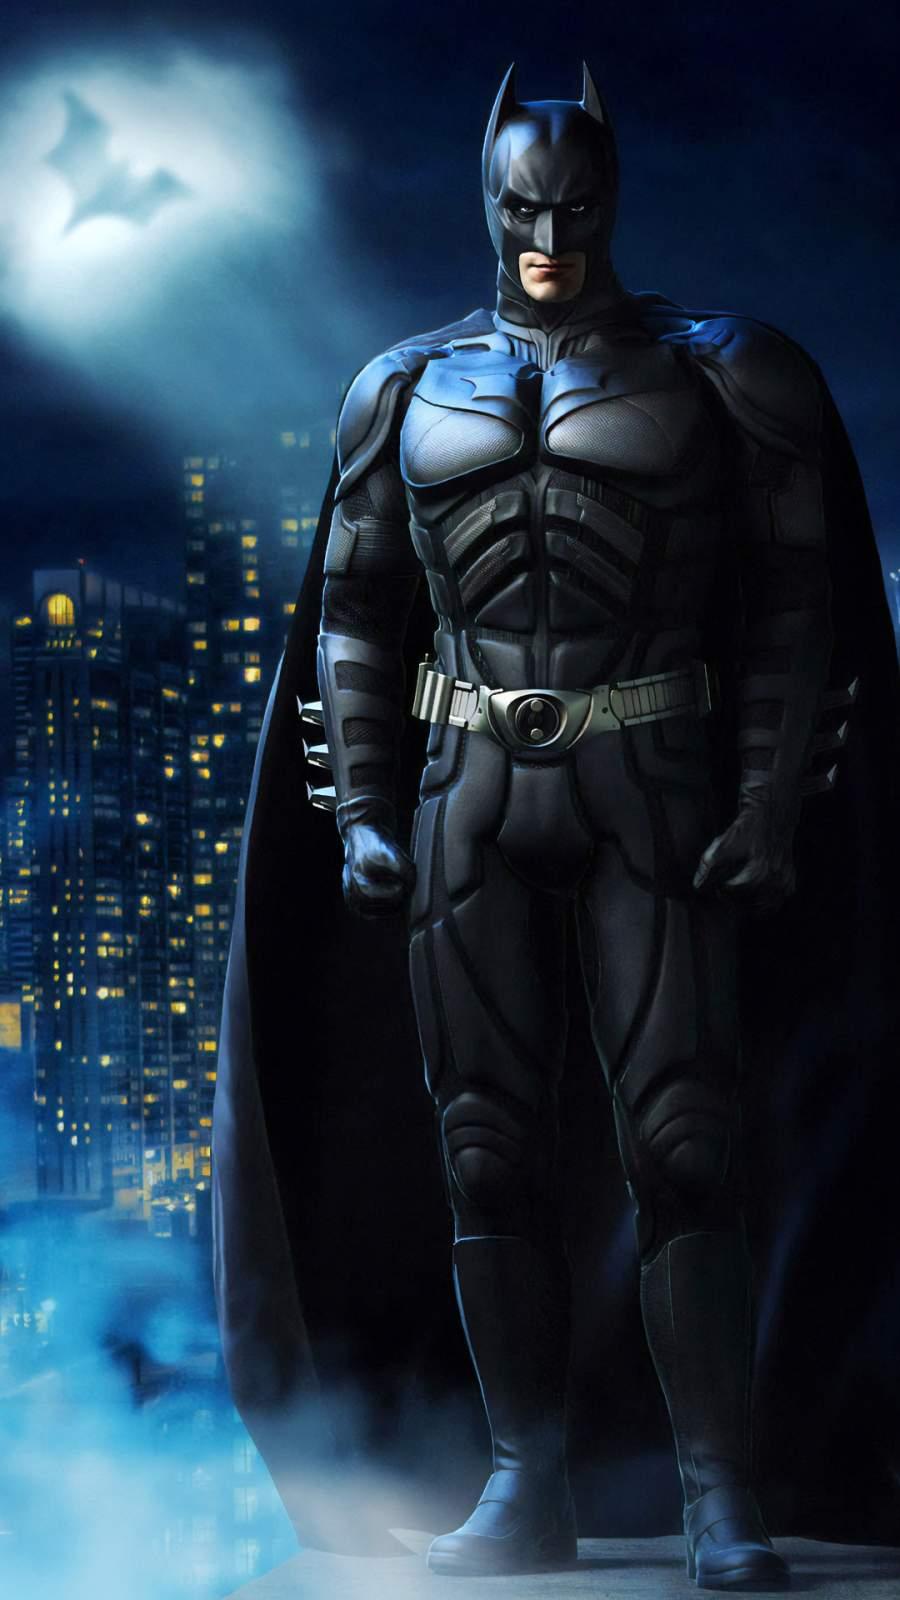 The Batman Art iPhone Wallpaper